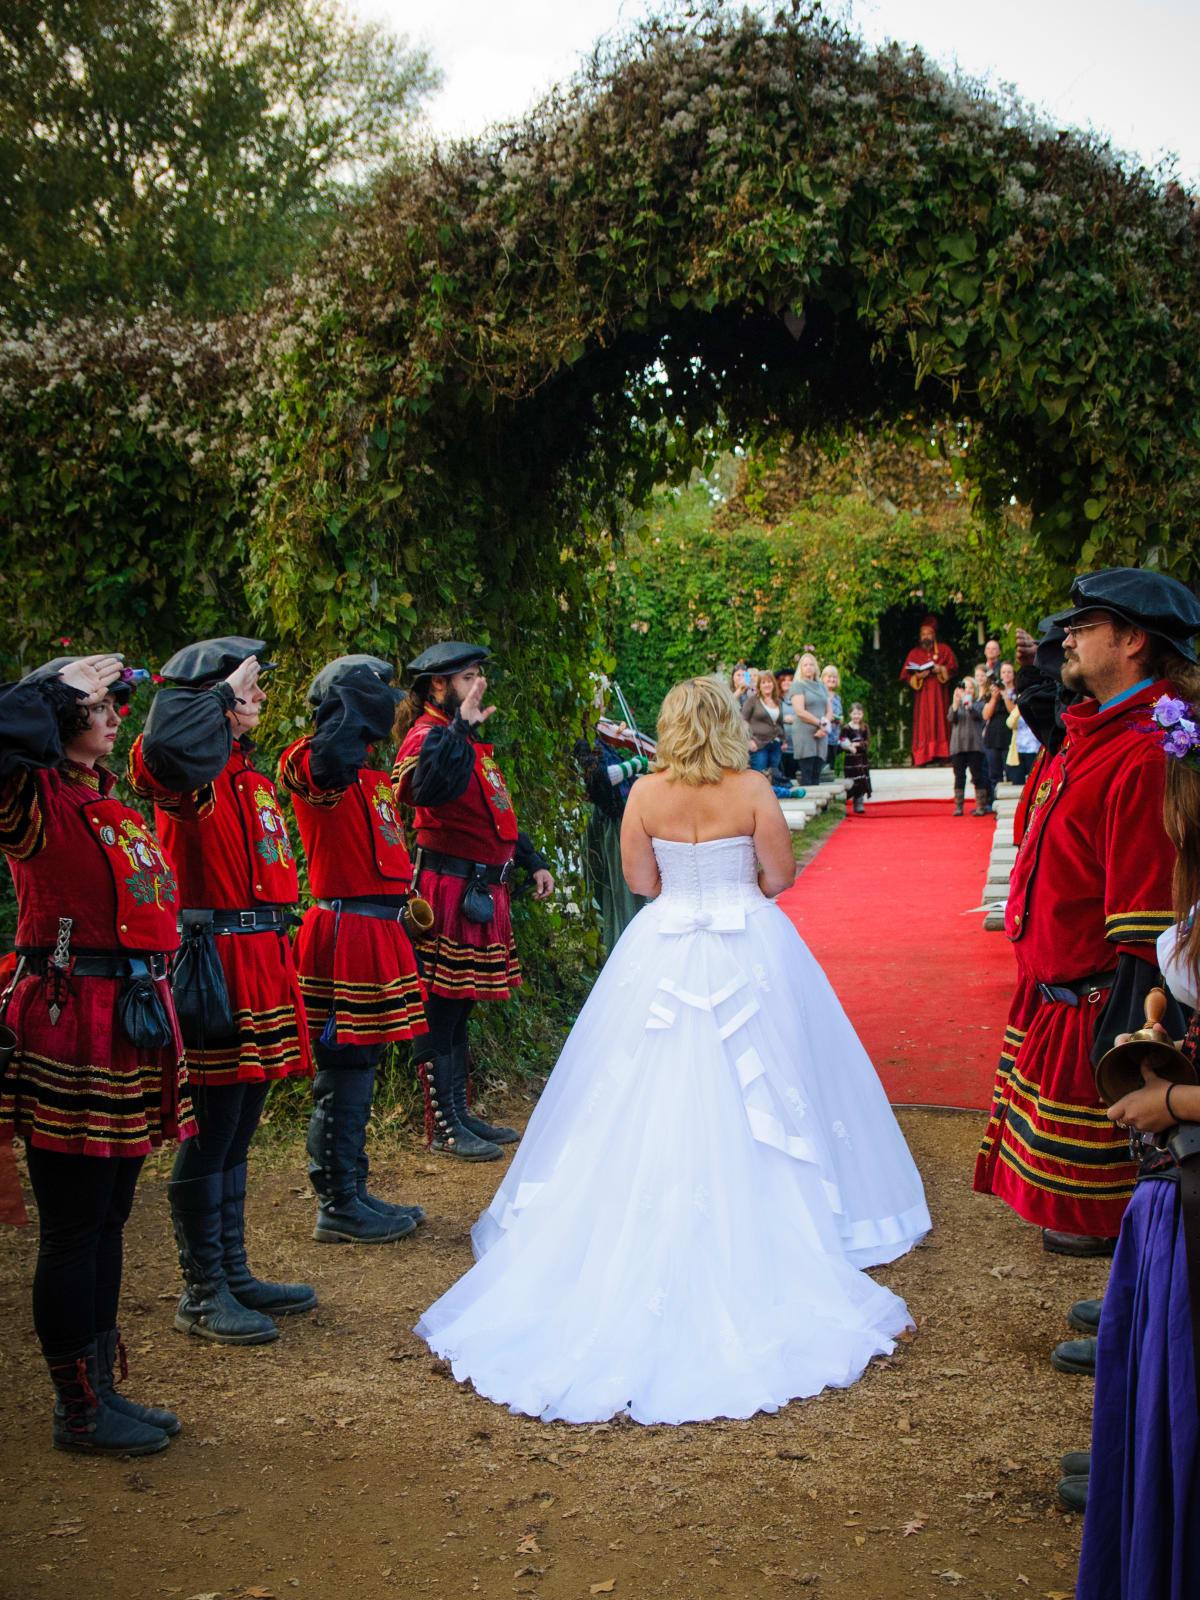 Renaissance Festival Weddings, Feb. 2016 Patty Raynor, Courtney Bohne